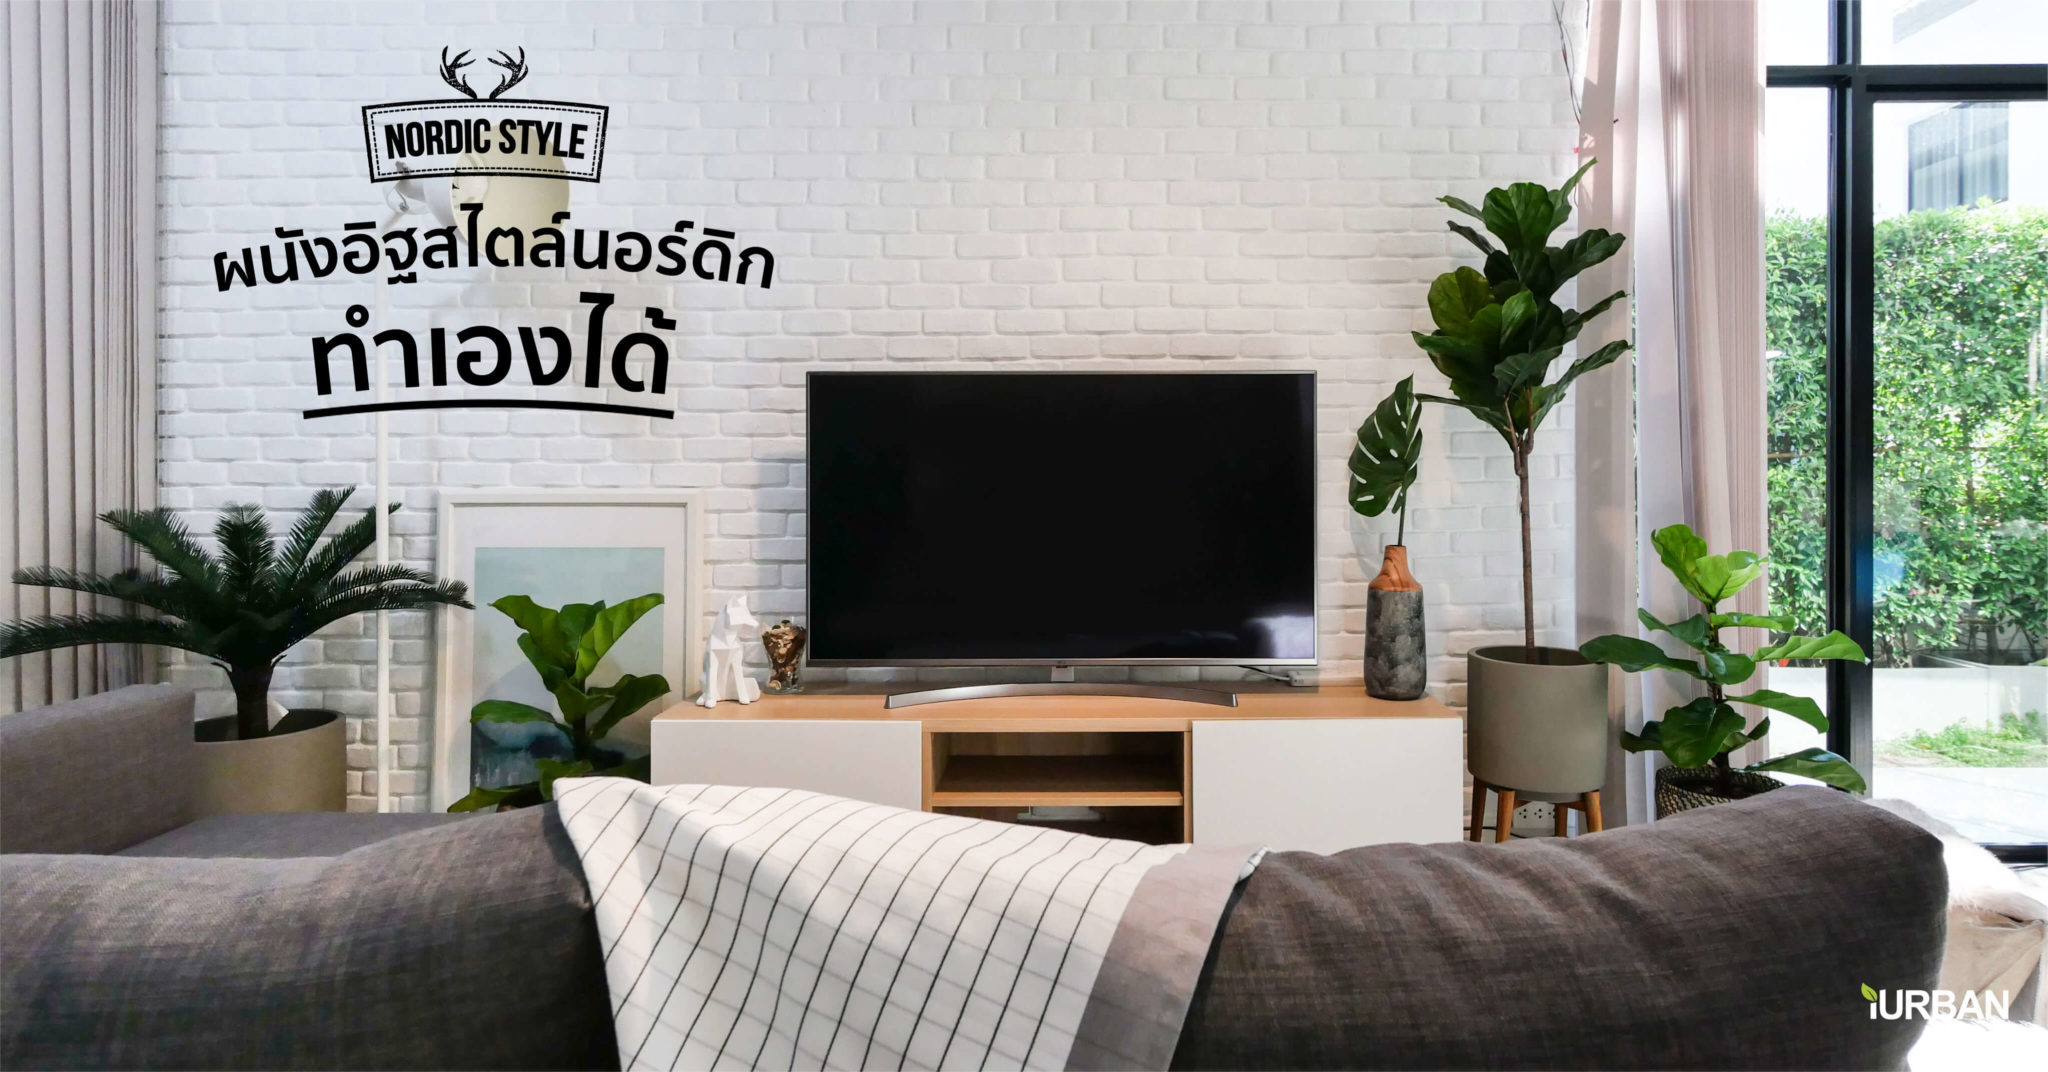 How to เปลี่ยนห้องนั่งเล่นเป็นสไตล์ Nordic ทำเองได้ ง่ายนิดเดียว! 13 - Highlight